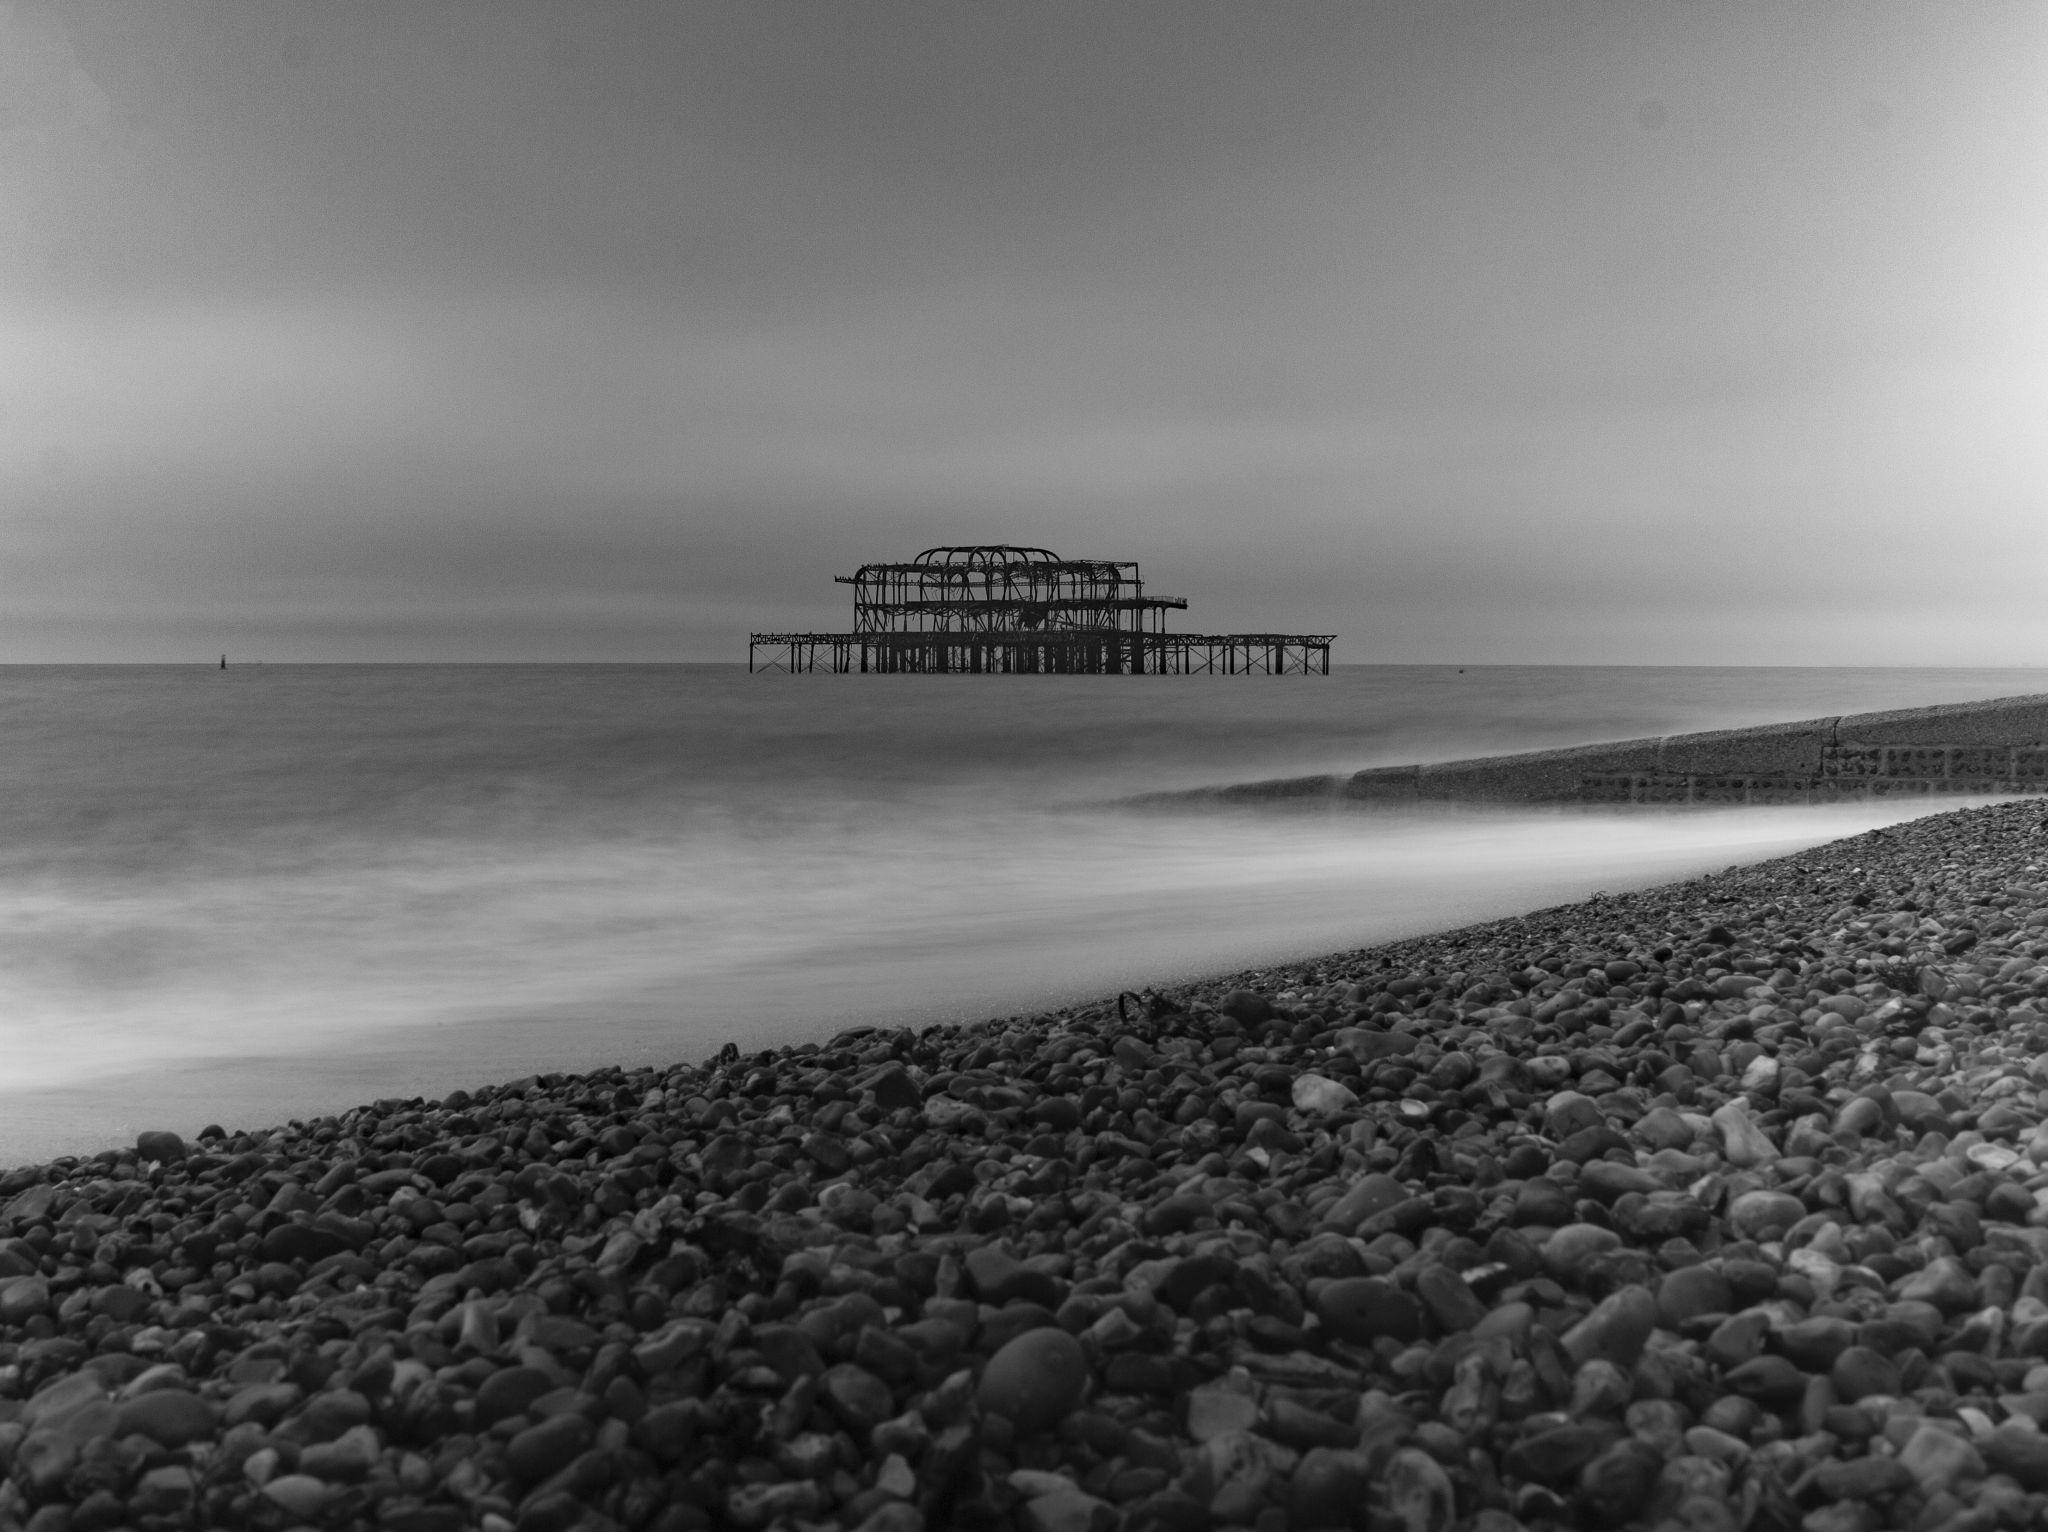 Brighton's West Pier: One photo, two edits